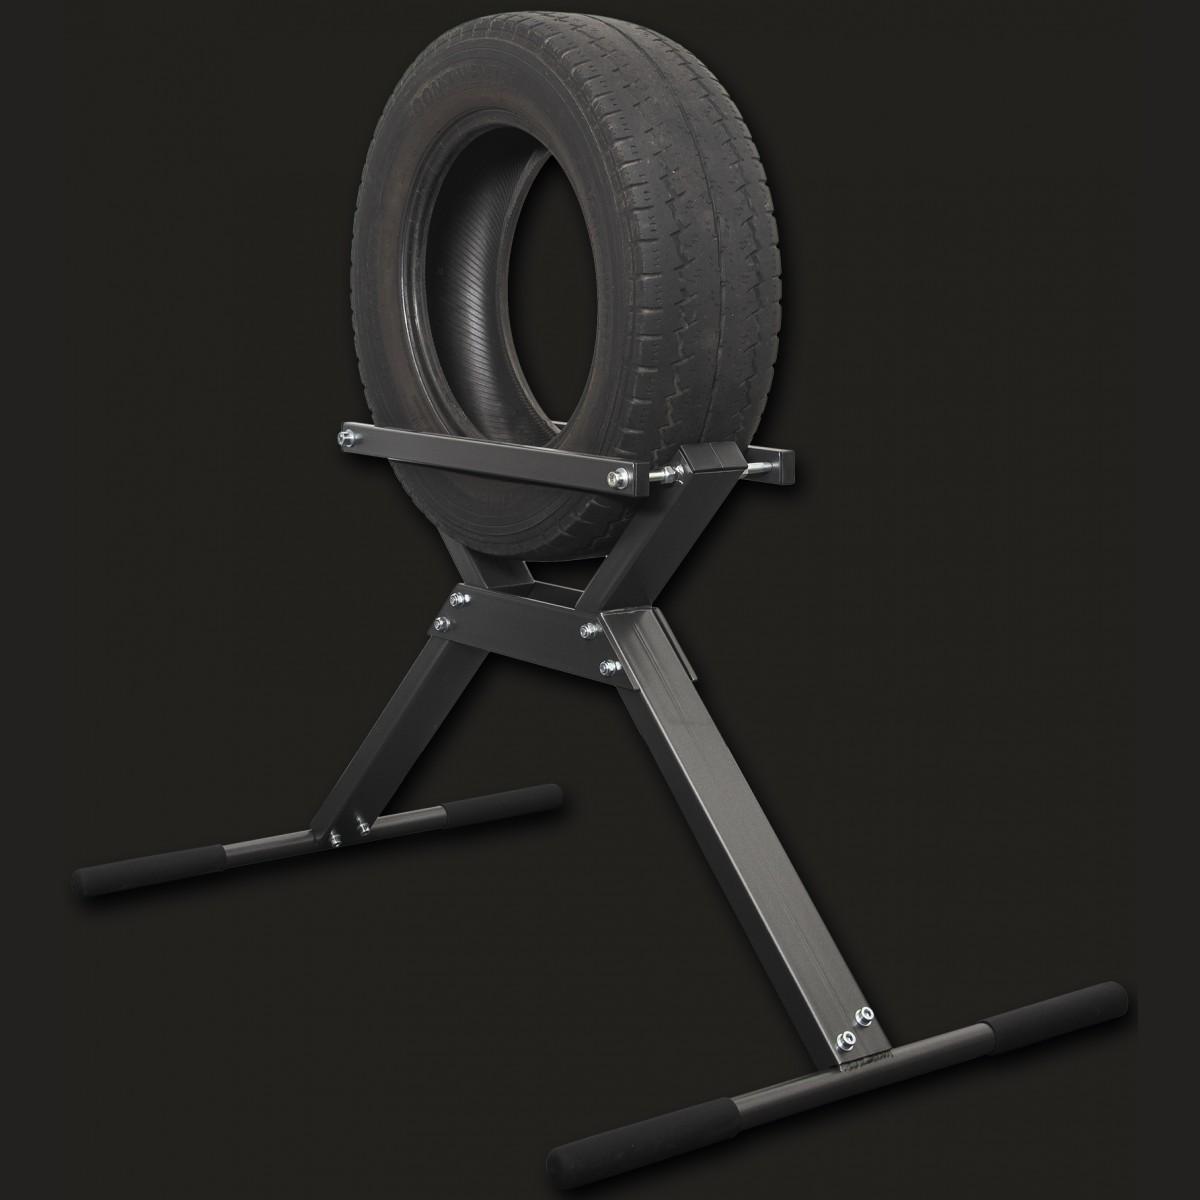 pro punching tyre rack